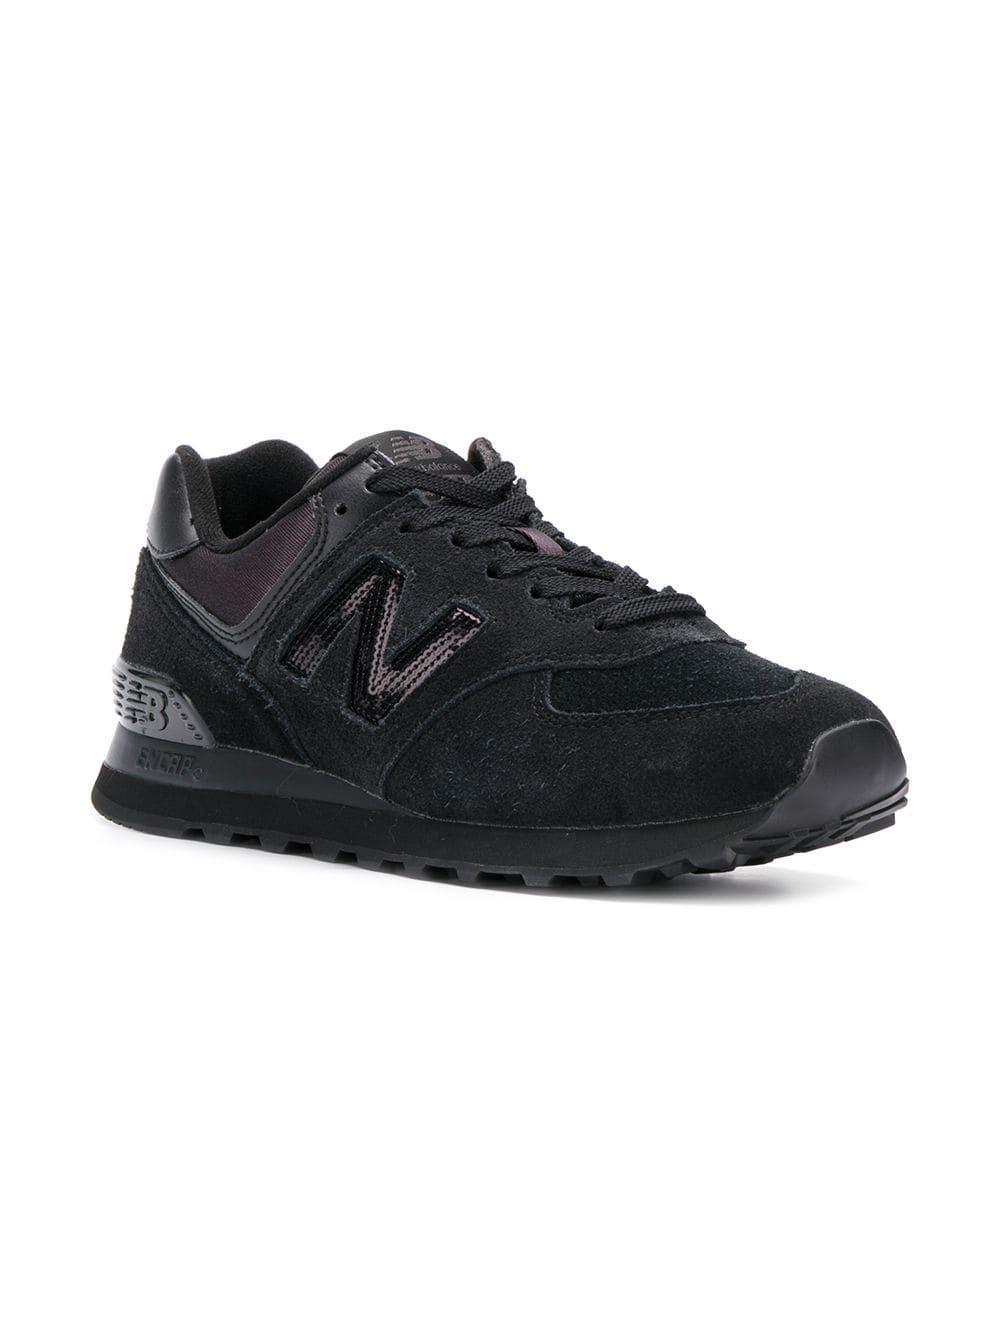 New Balance - Black 574 Sneakers - Lyst. View fullscreen 34fe90584